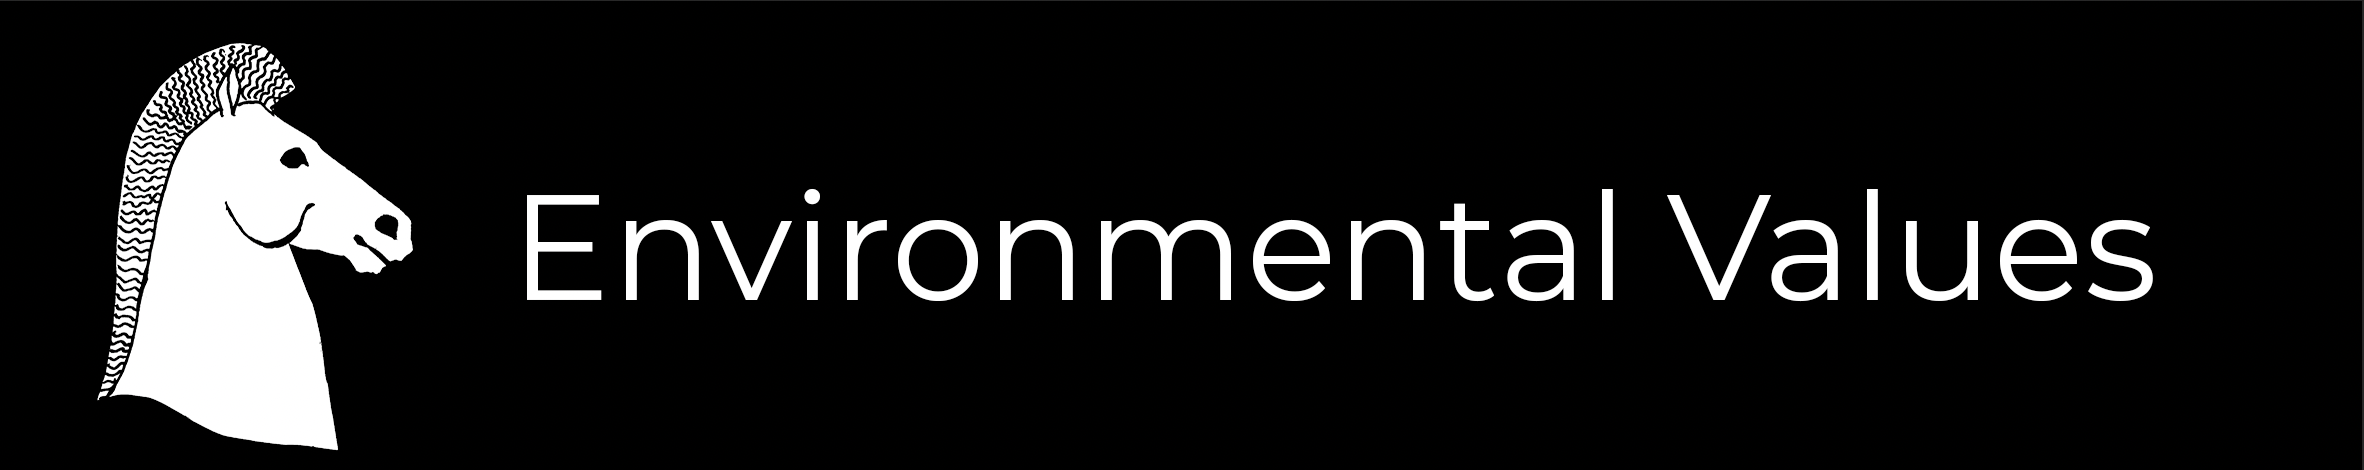 Environmental Values logo